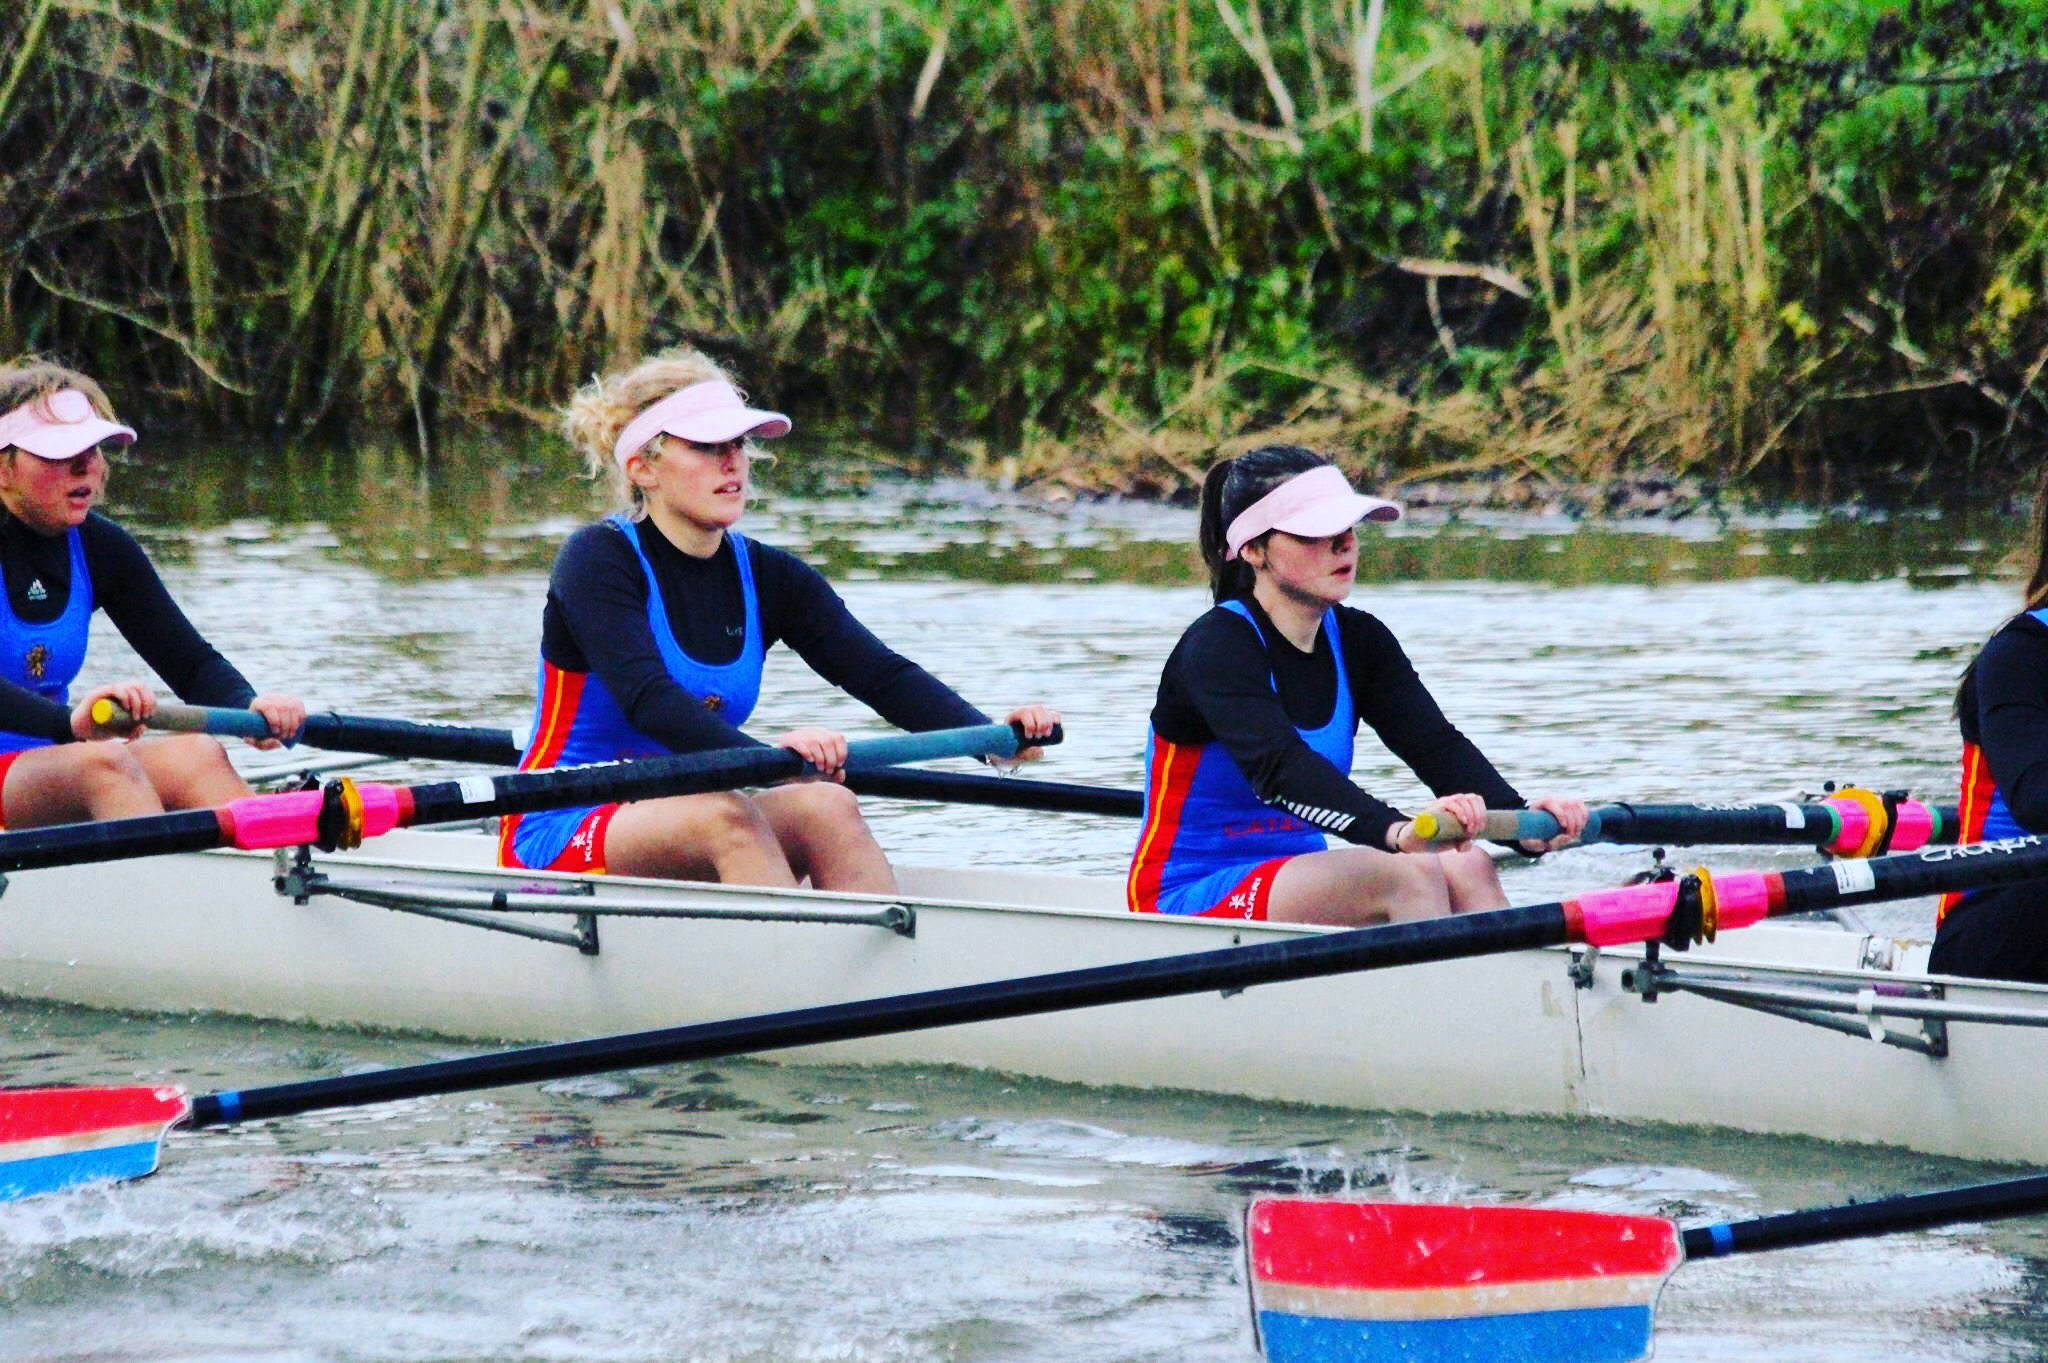 Naomi Linford, University of Birmingham Rowing Club